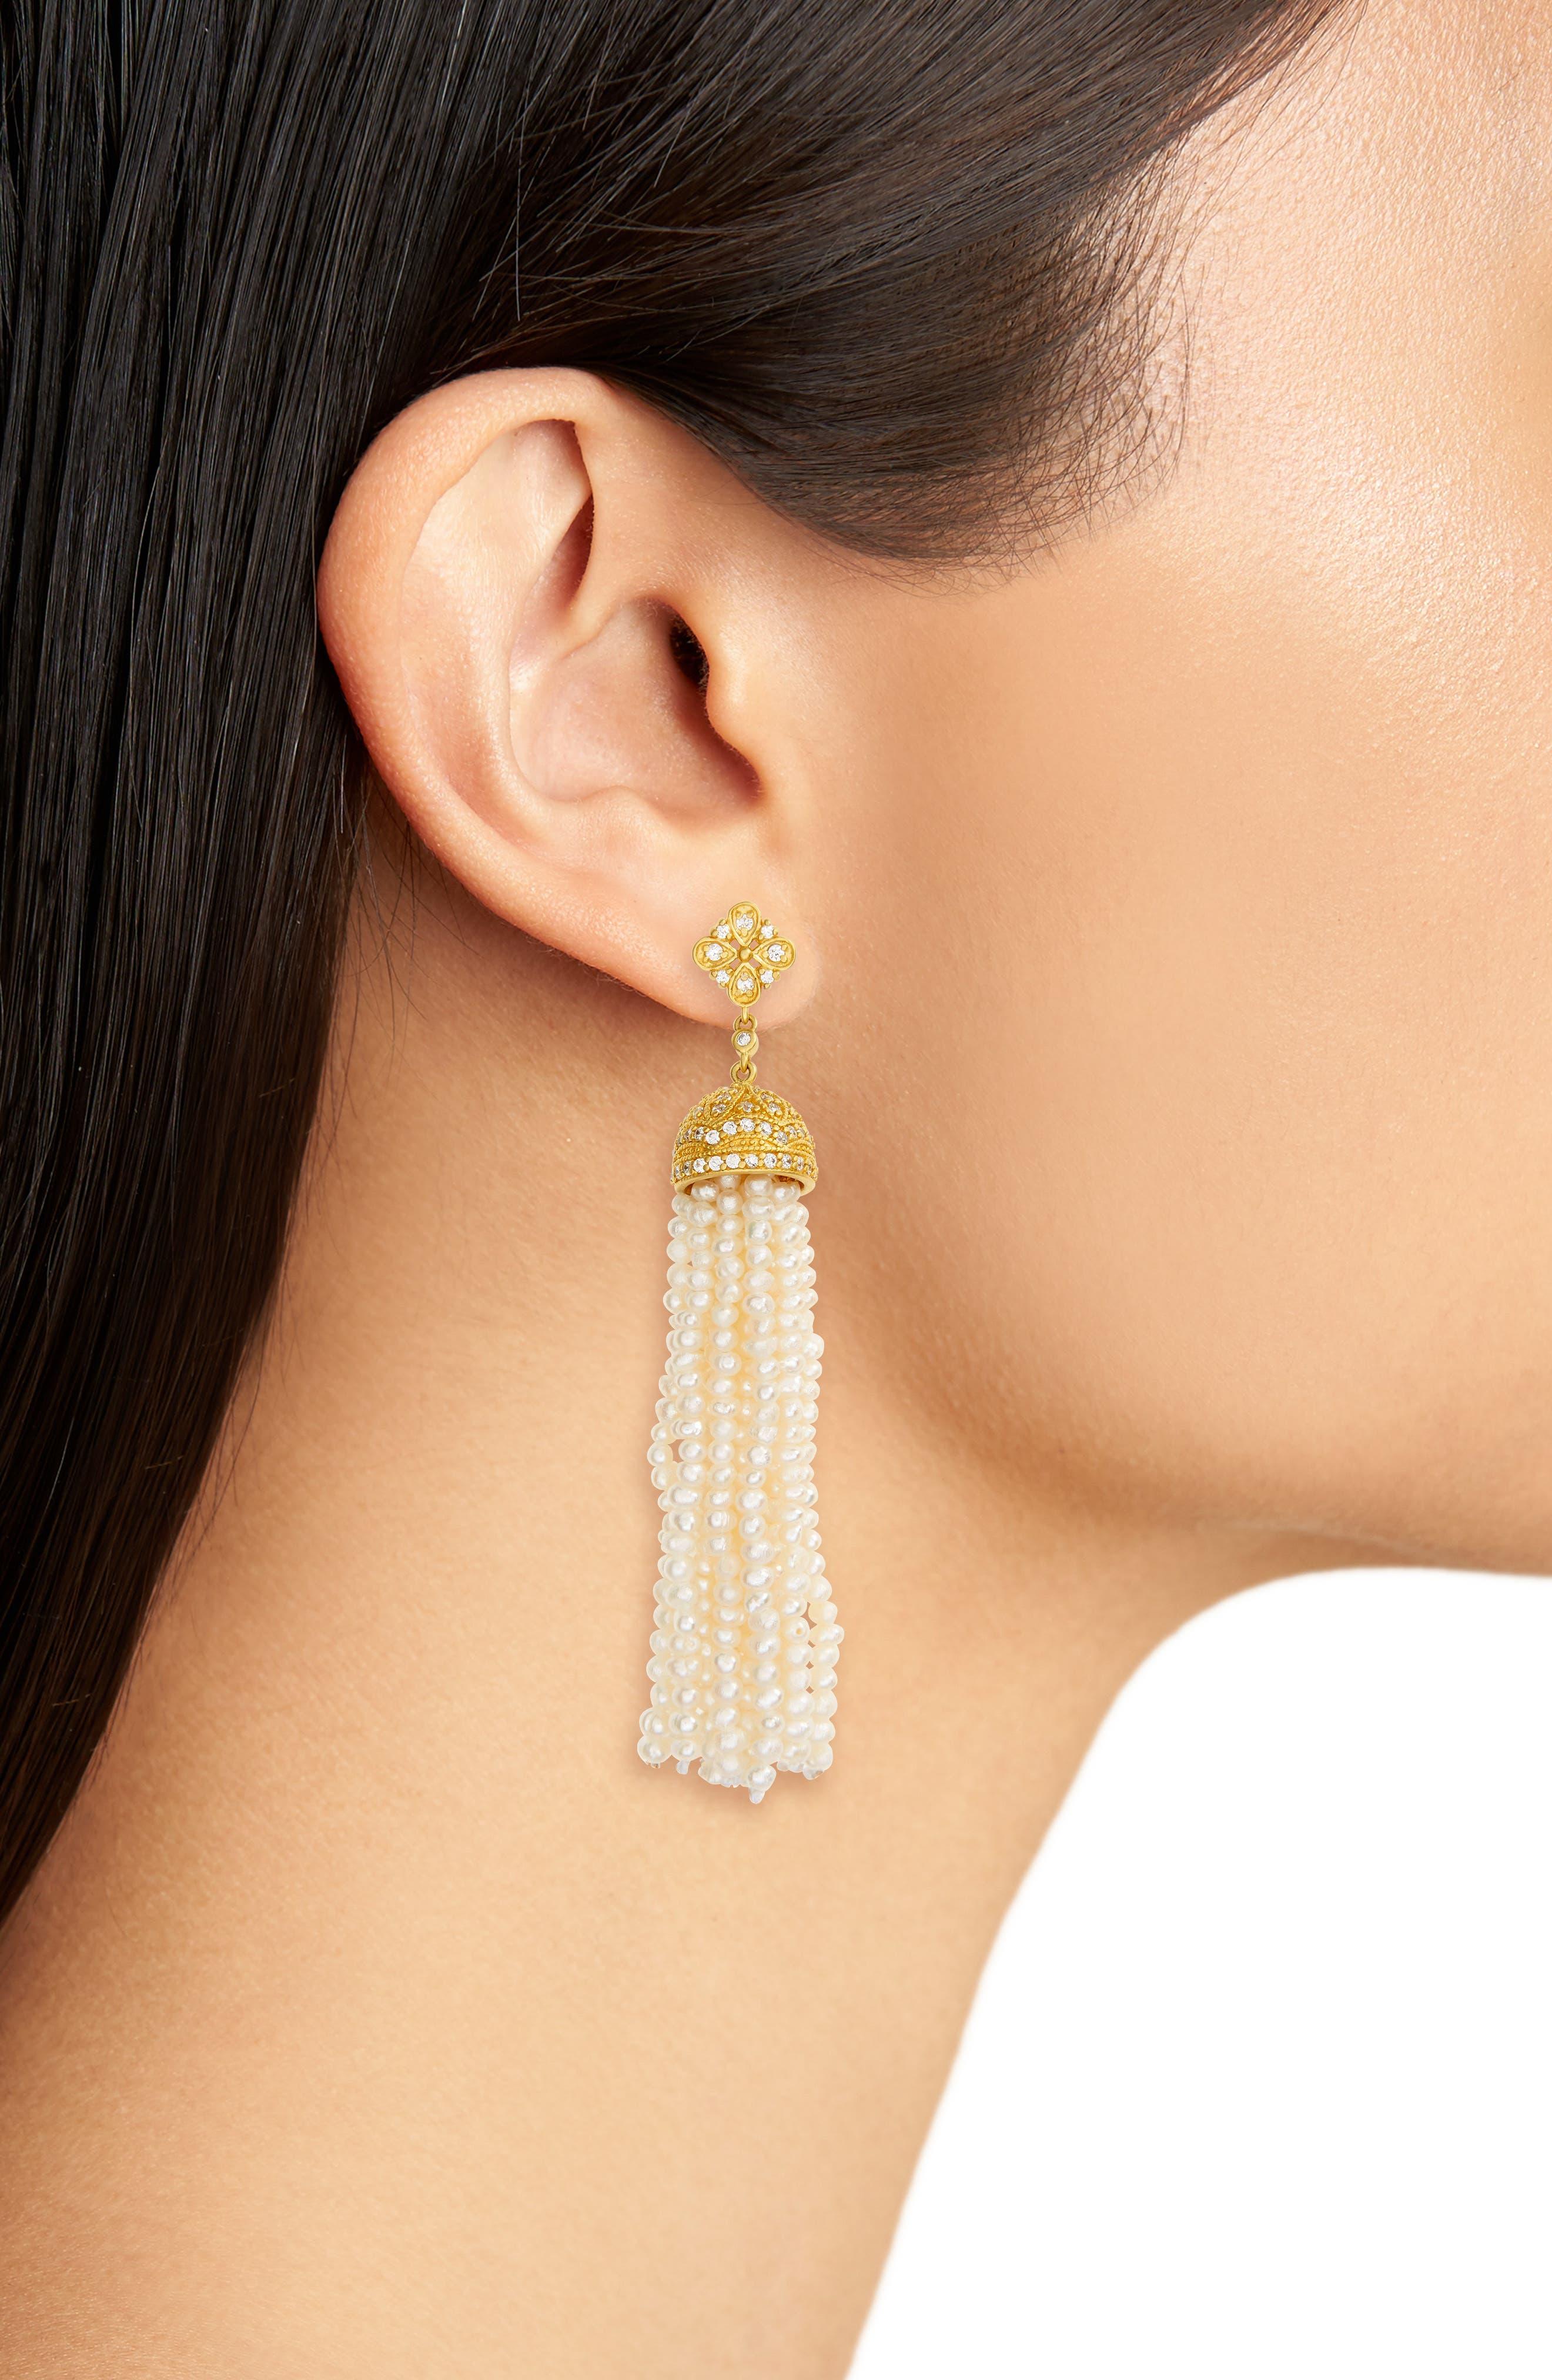 Audrey Waterfall Tassel Pearl Earrings,                             Alternate thumbnail 2, color,                             710